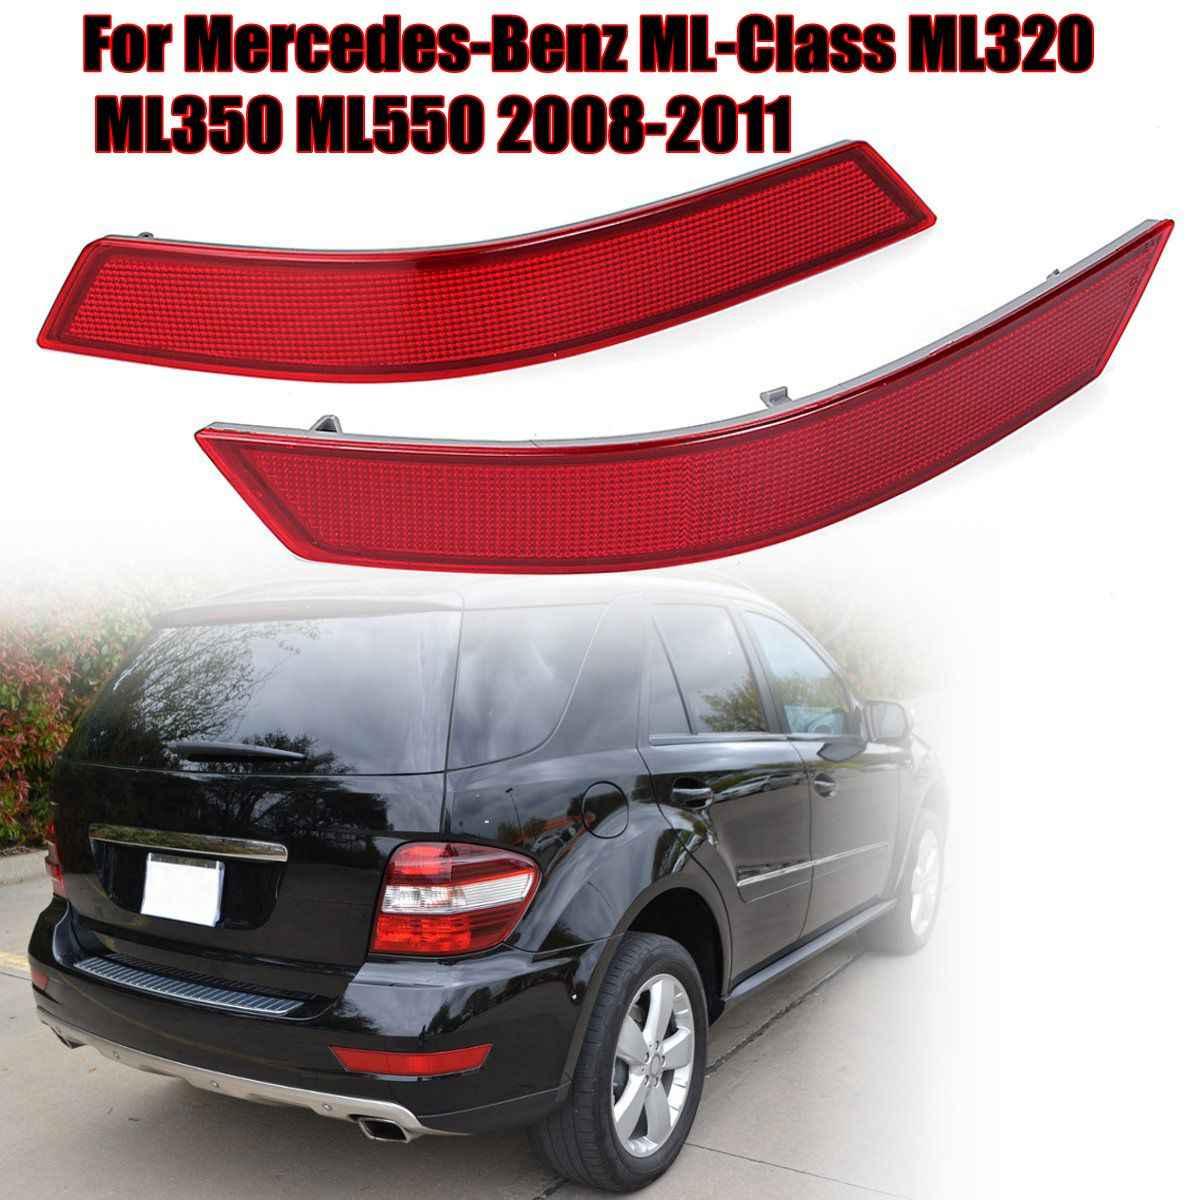 Mercedes clase m ml w163 puertas goma trasera izquierda o derecha